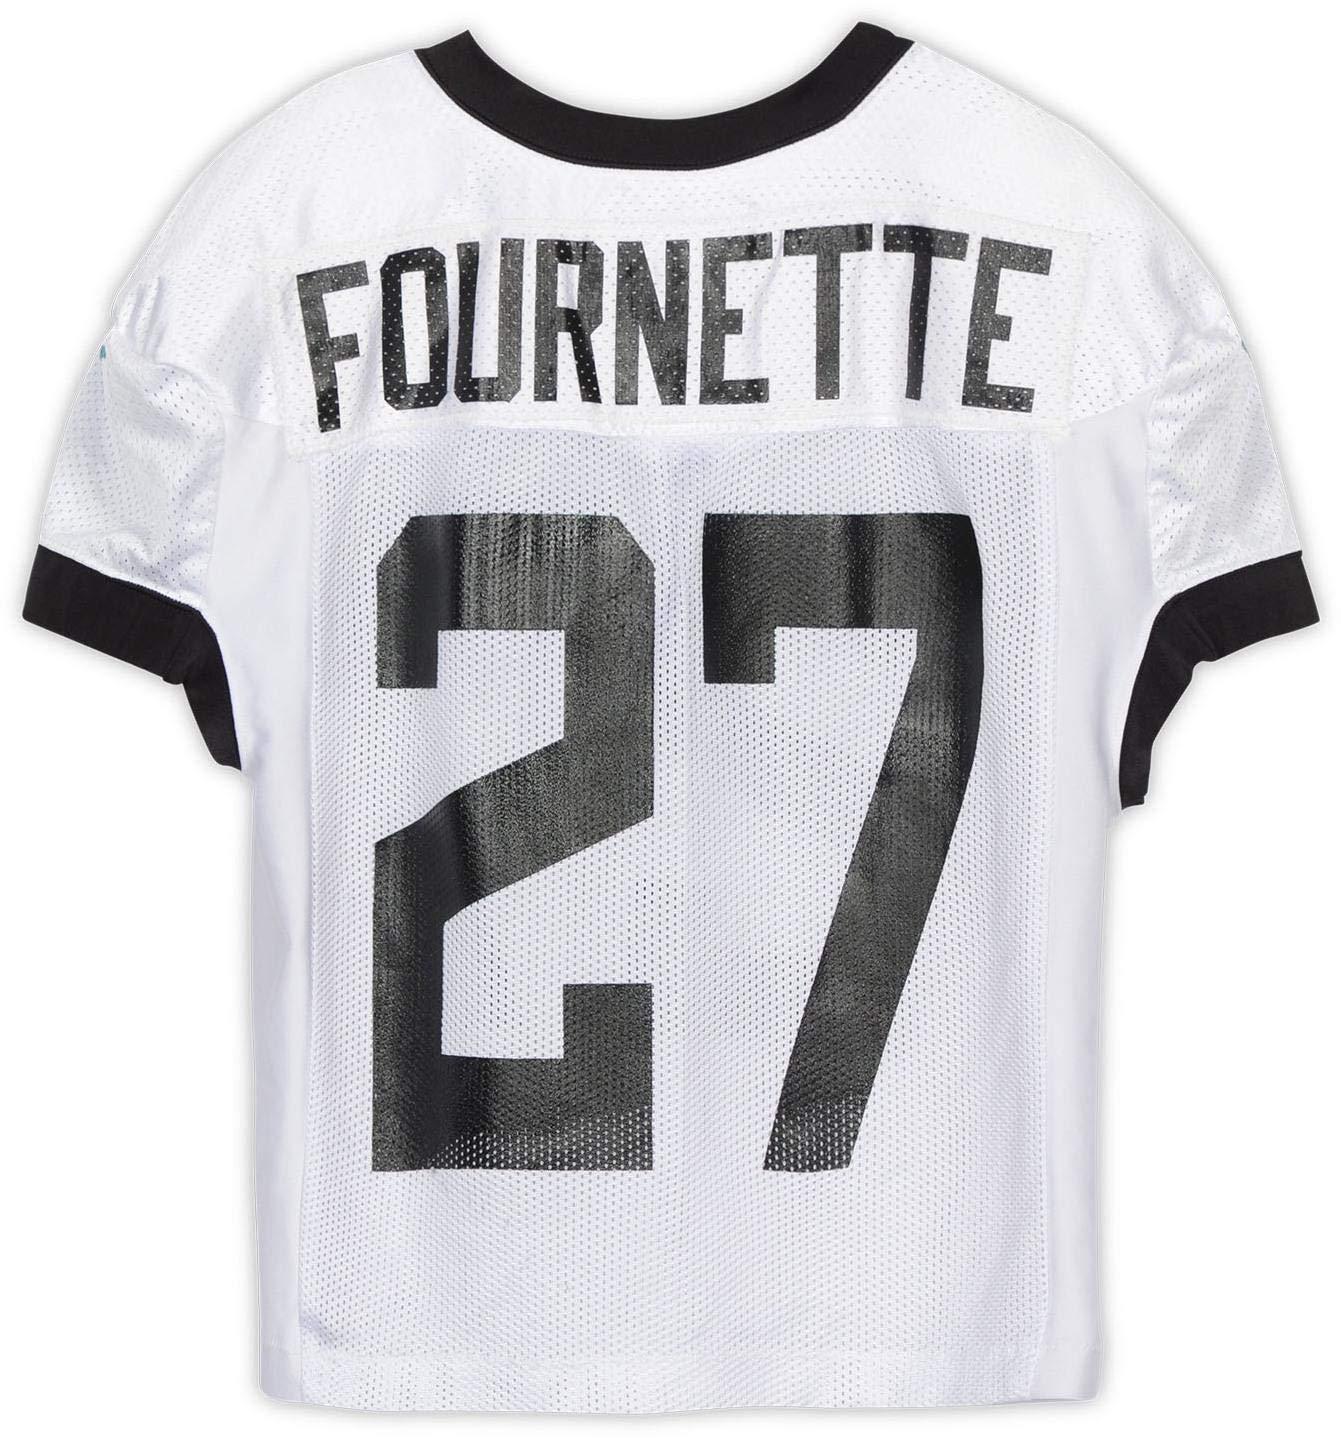 newest 8b1e3 6d0a9 Leonard Fournette Jacksonville Jaguars Practice-Used #27 ...